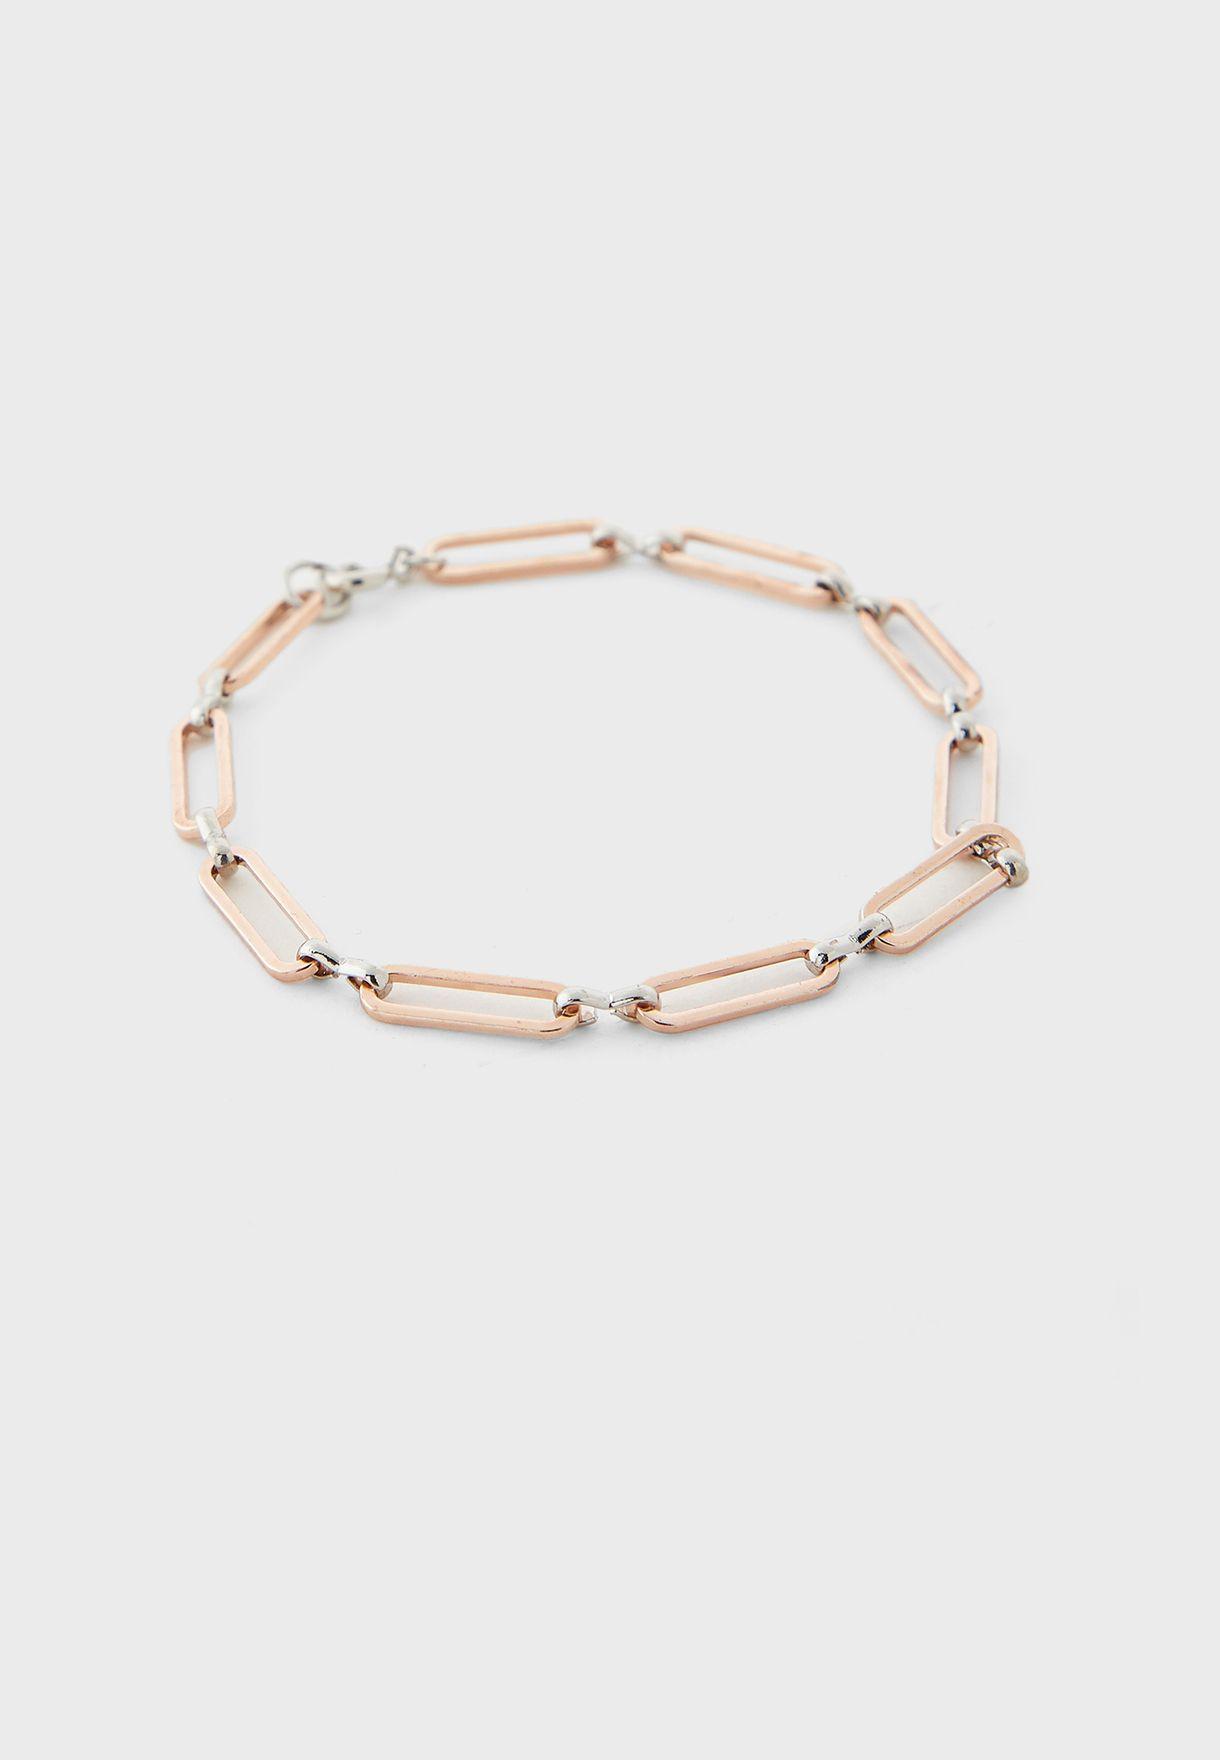 Mix Metal Watch And Bracelet Gift Set